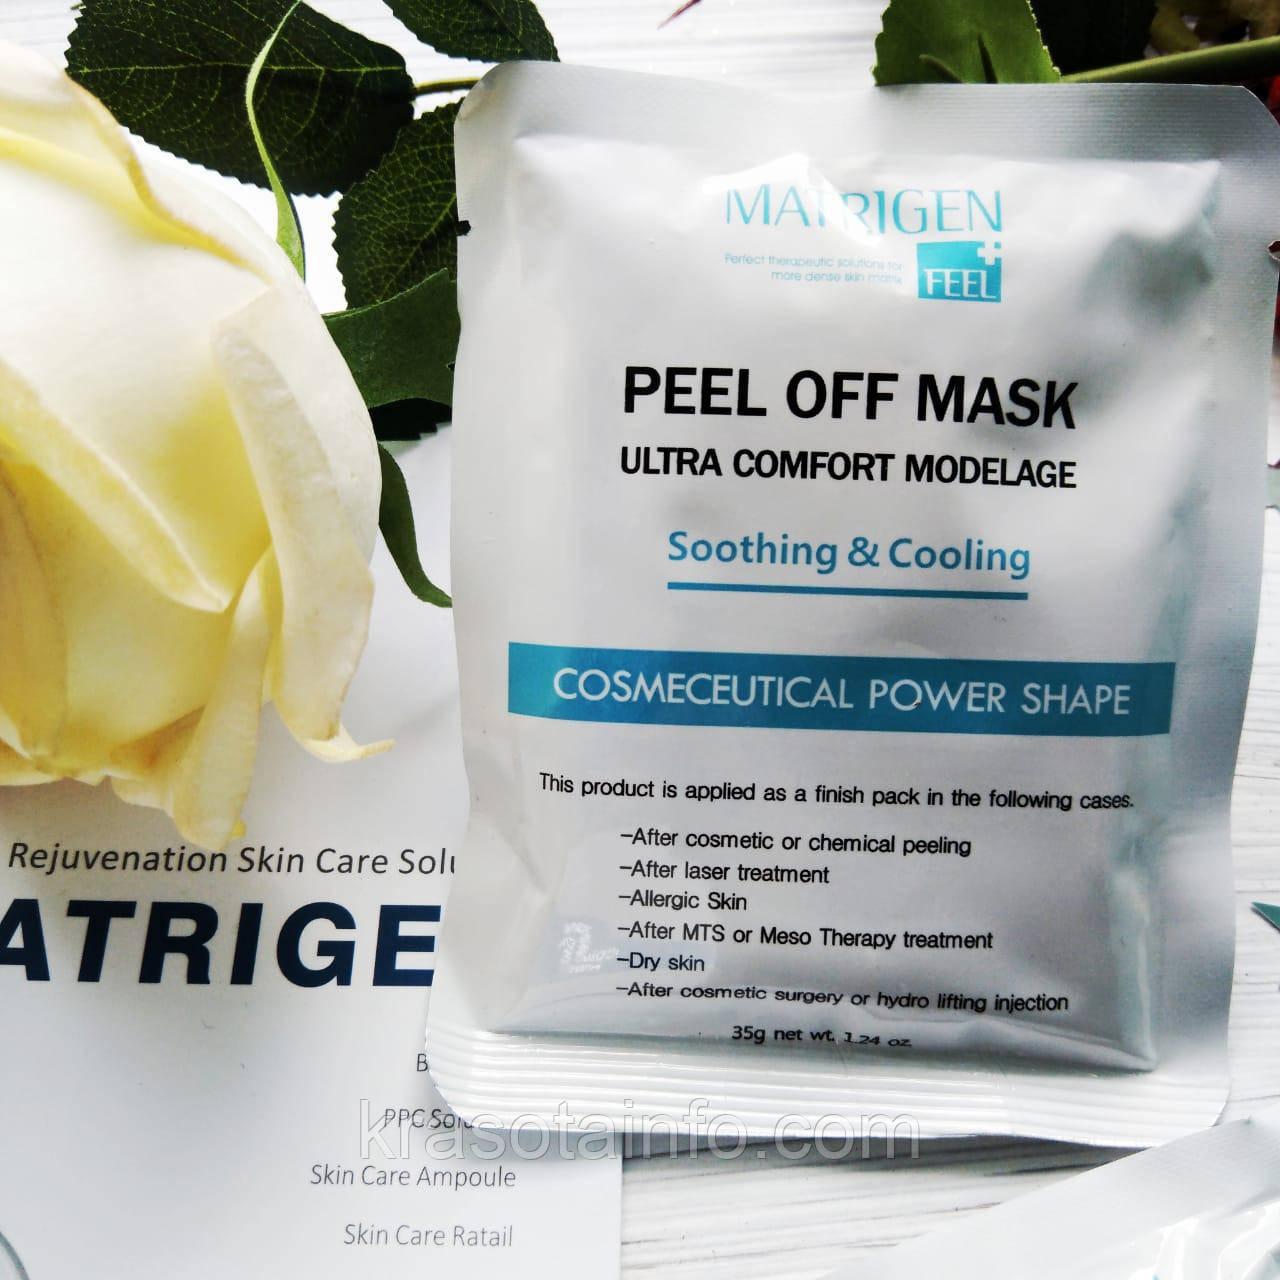 Matrigen альгинатная маска Peel OFF Mask Soothing & Cooling 1шт -35грамм